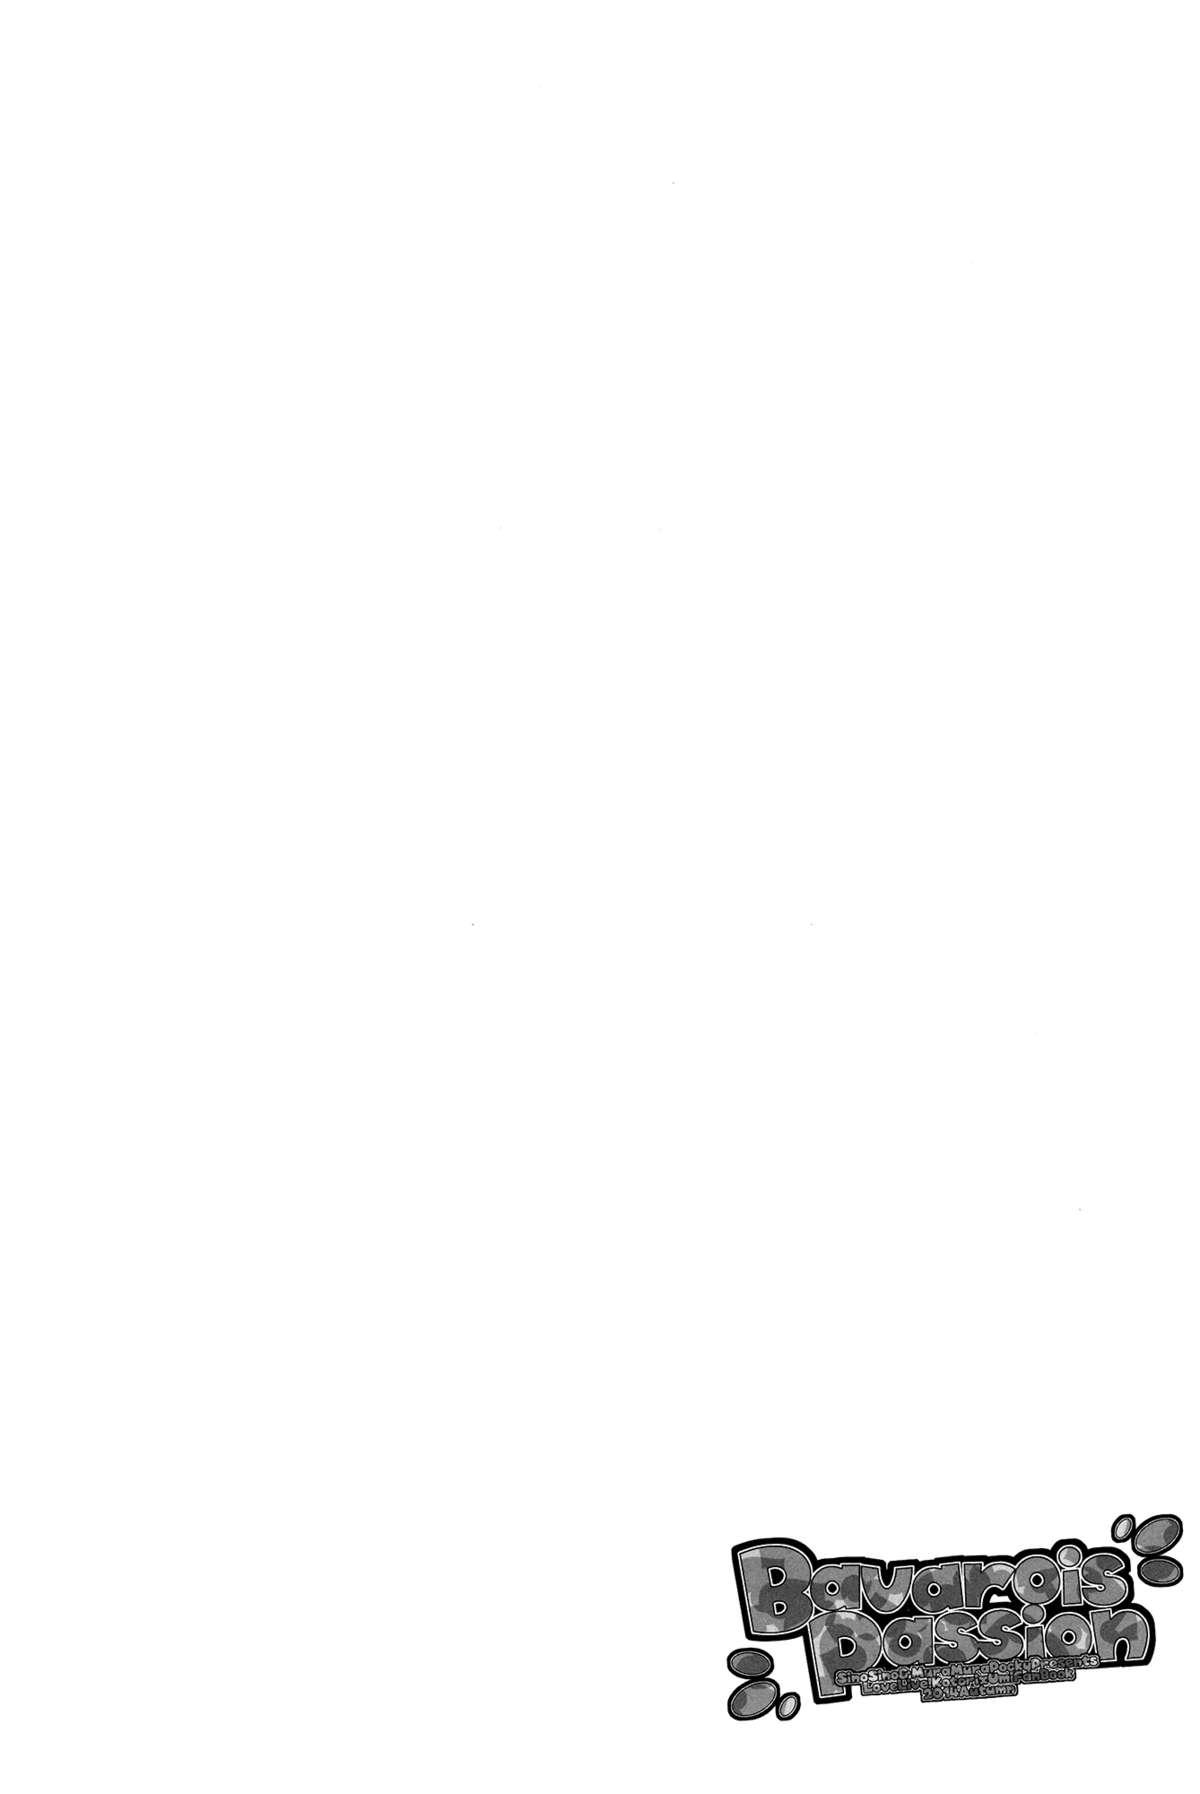 HentaiVN.net - Ảnh 3 - Bavarois Passion (Love Live!) - Chap 1